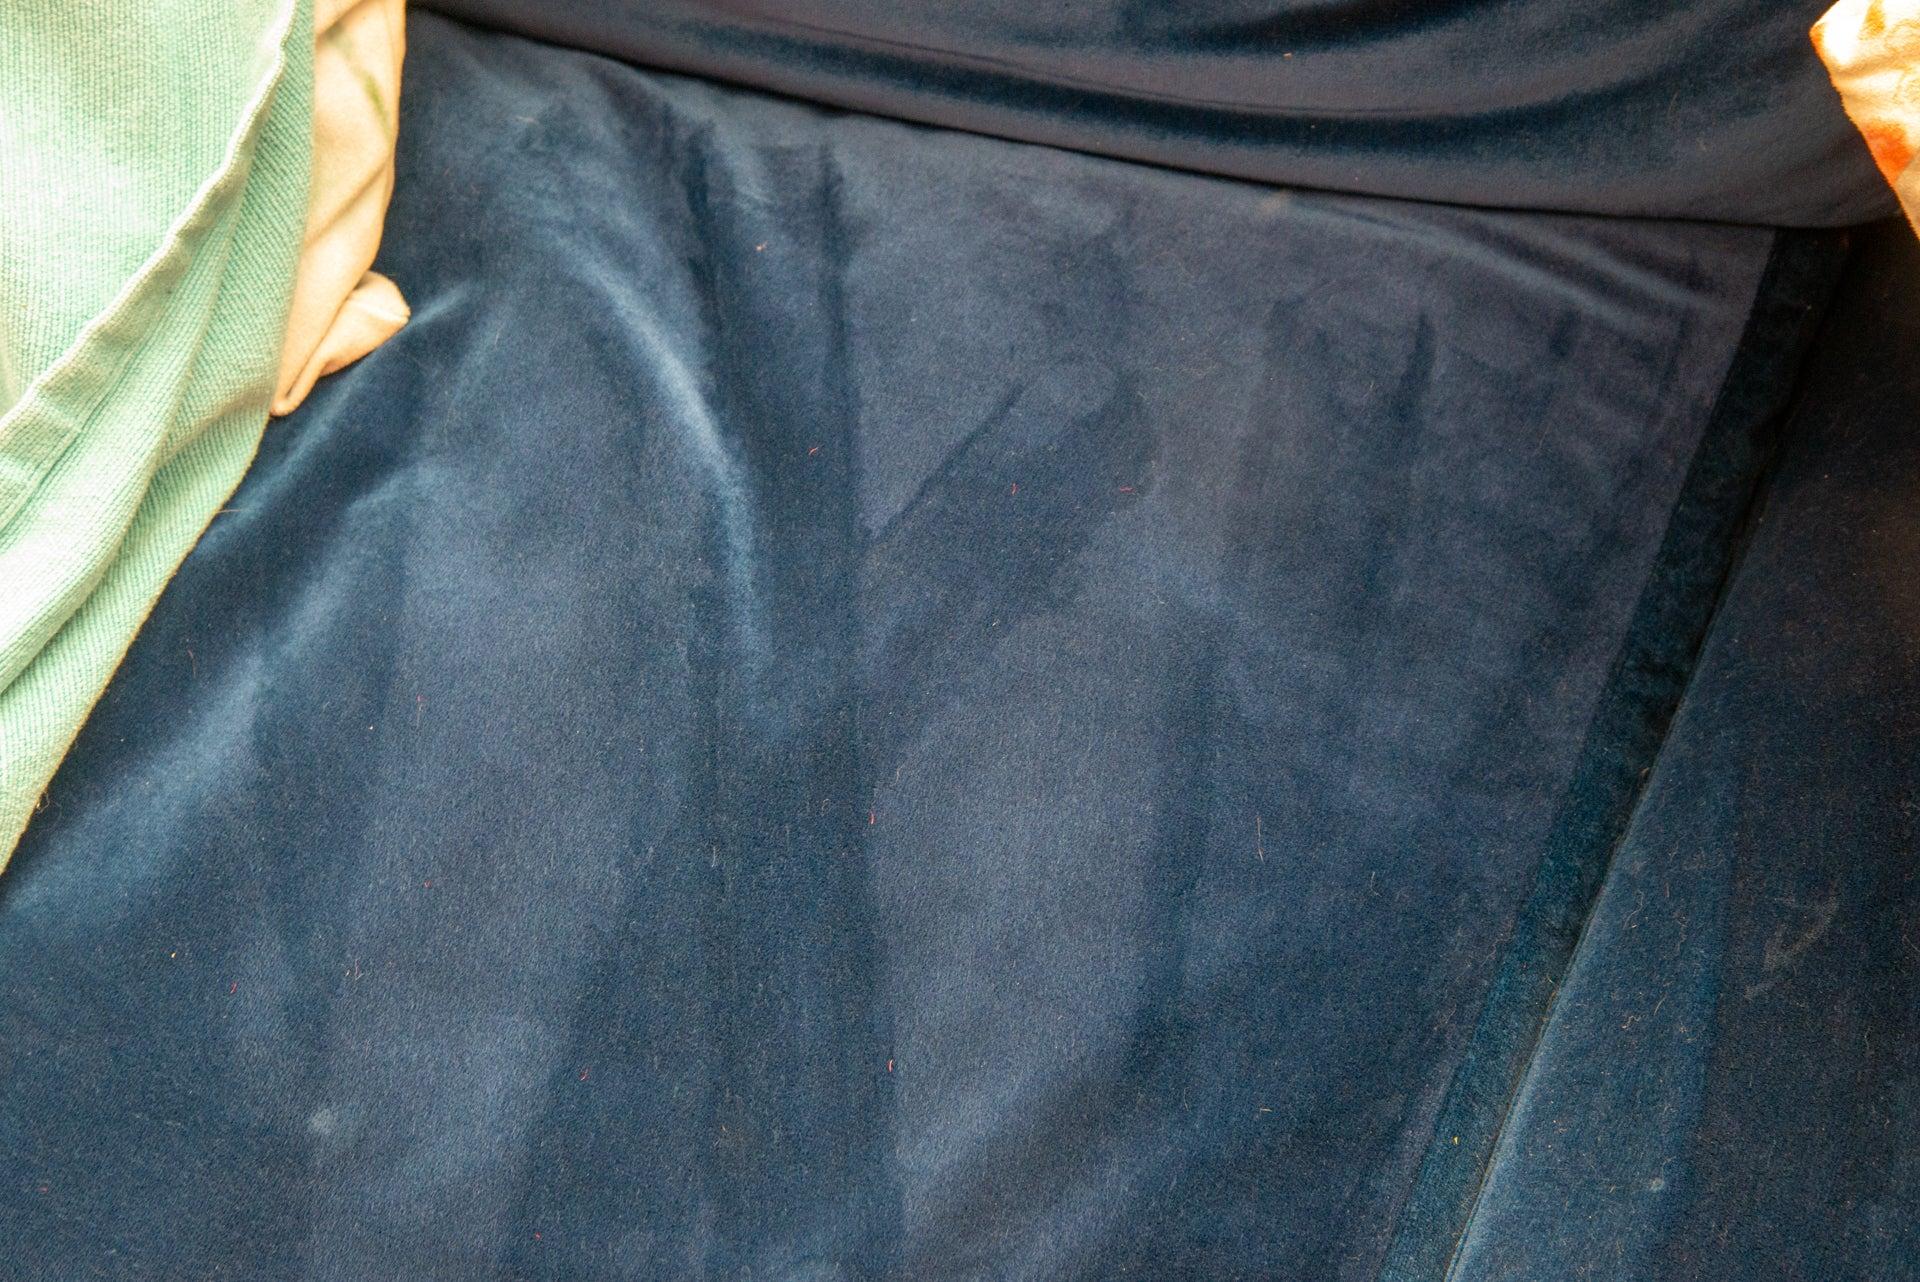 Hoover H-Handy 700 clean sofa